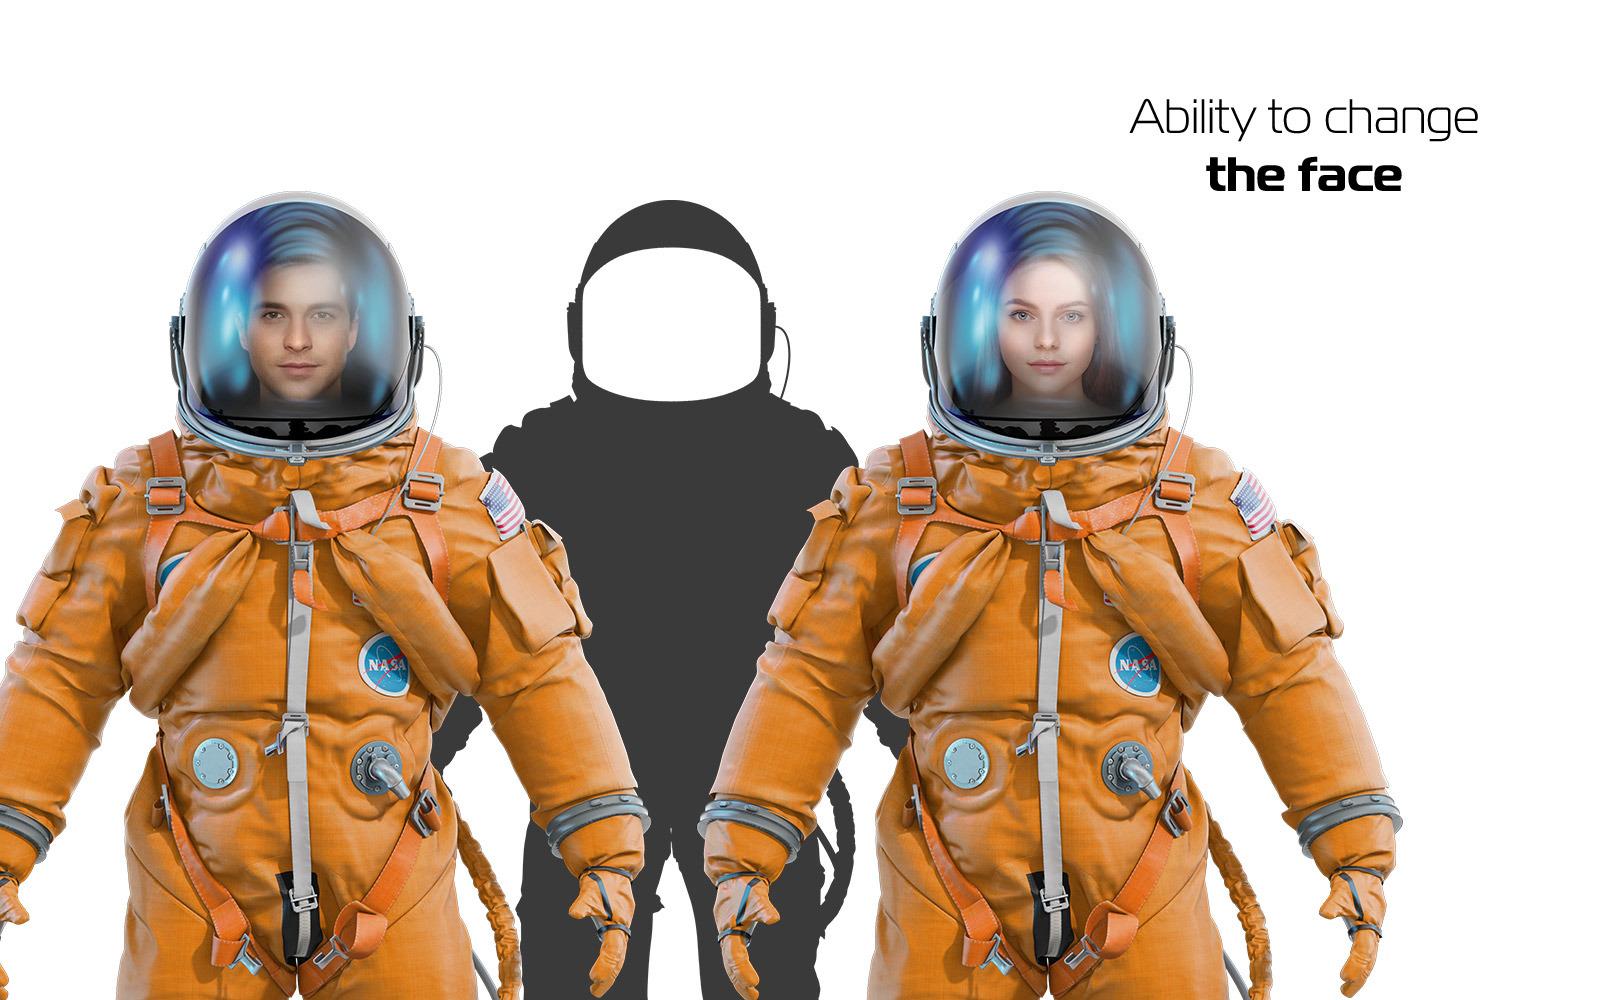 PSD Mockup 3D model NASA Astronaut #31